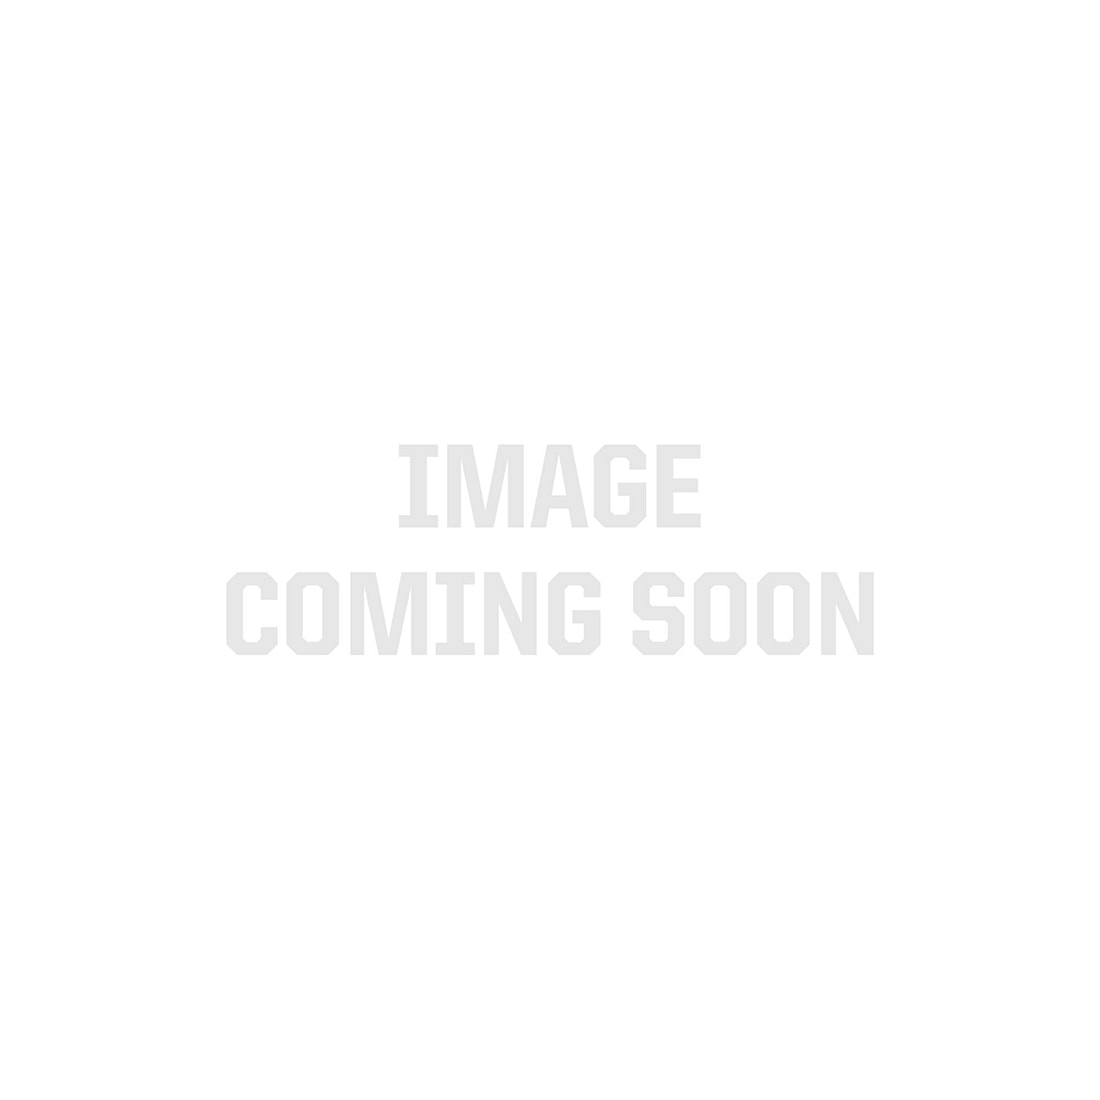 Molex MiniFit Jr 8-Pin Connector Kit - L